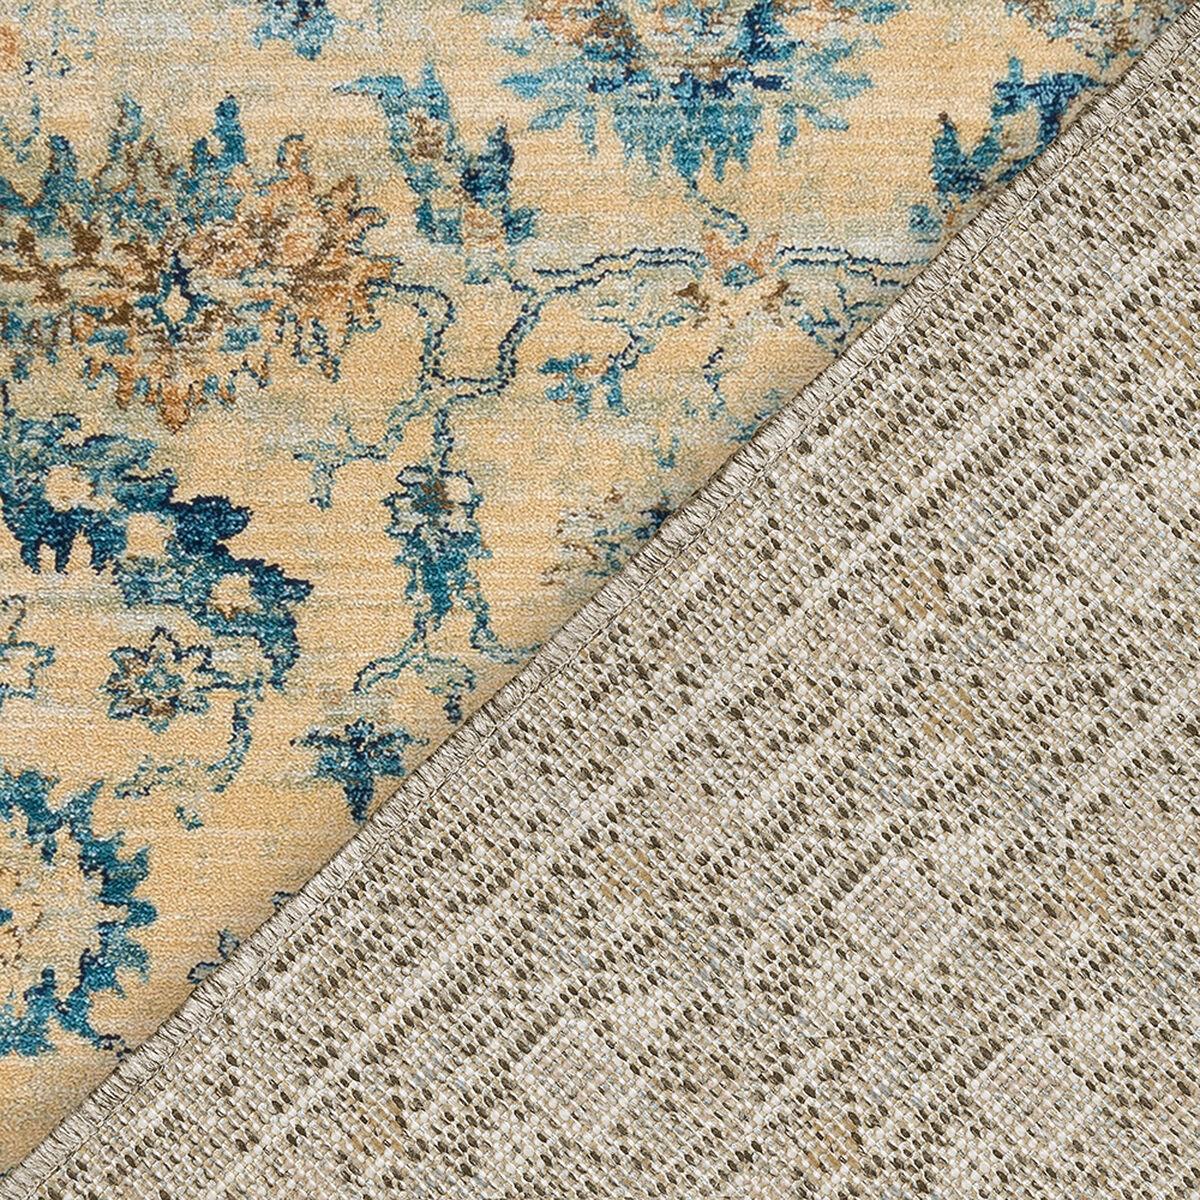 Alfombra Frise Mashini Genova Pisa 133 x 190 cm